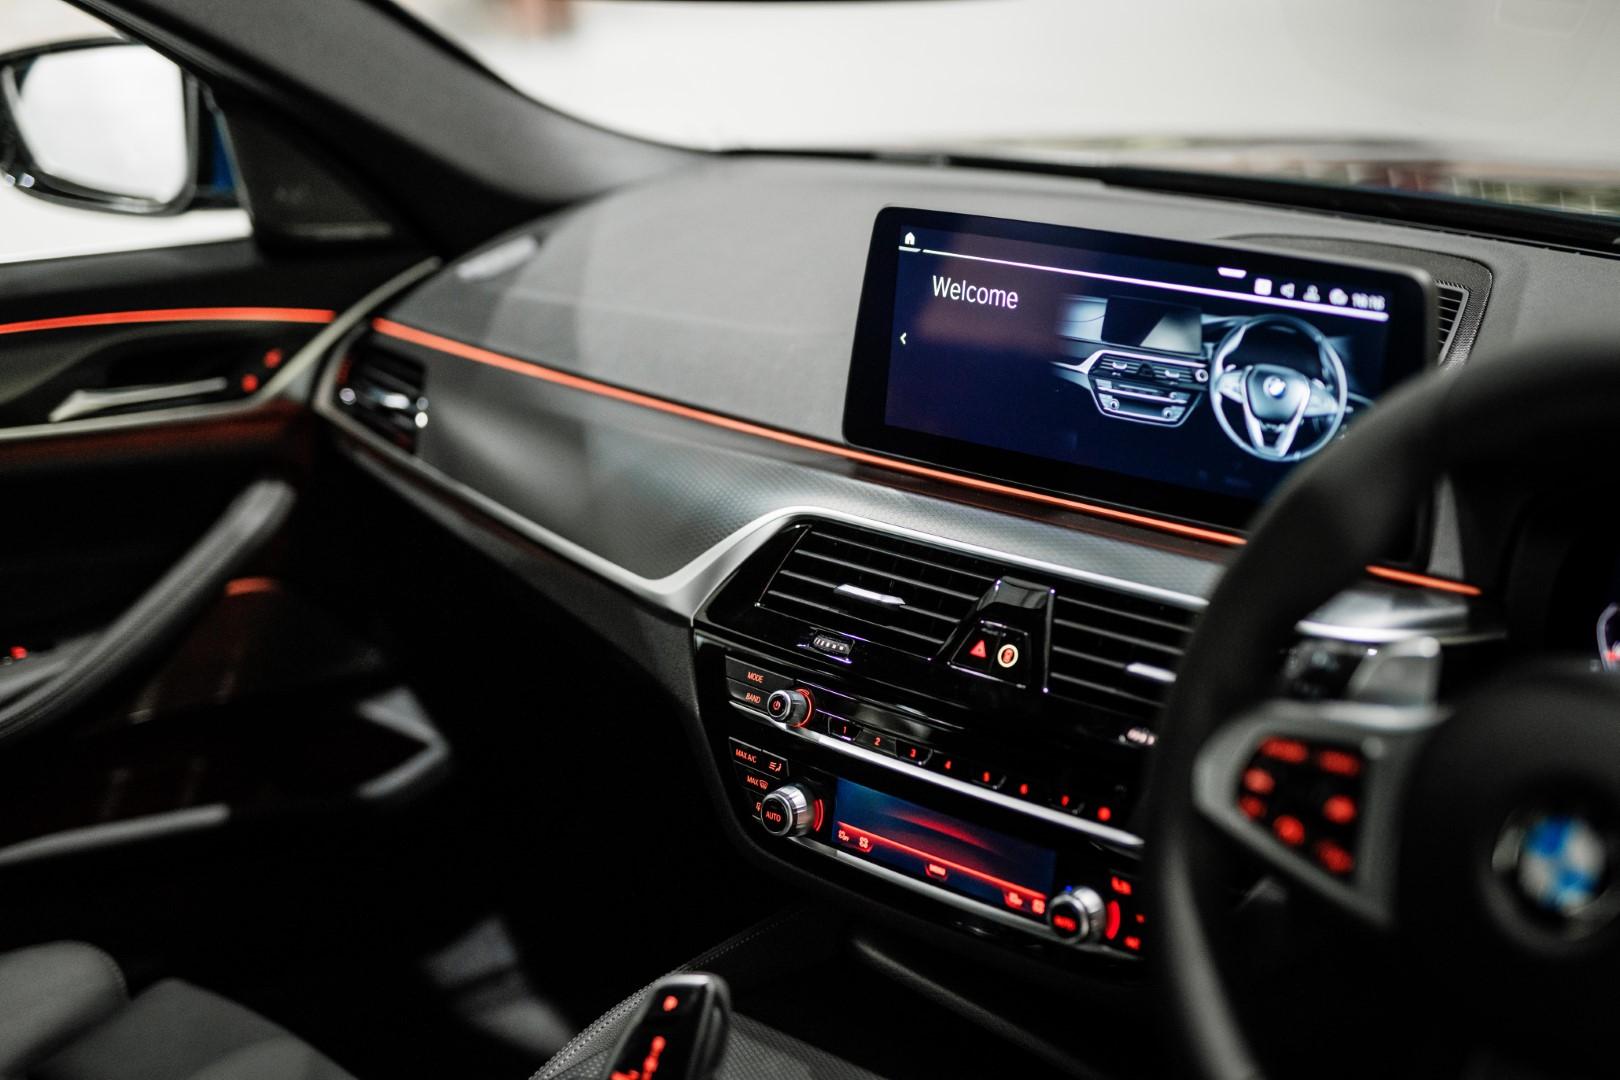 New BMW 5 Series infotainment